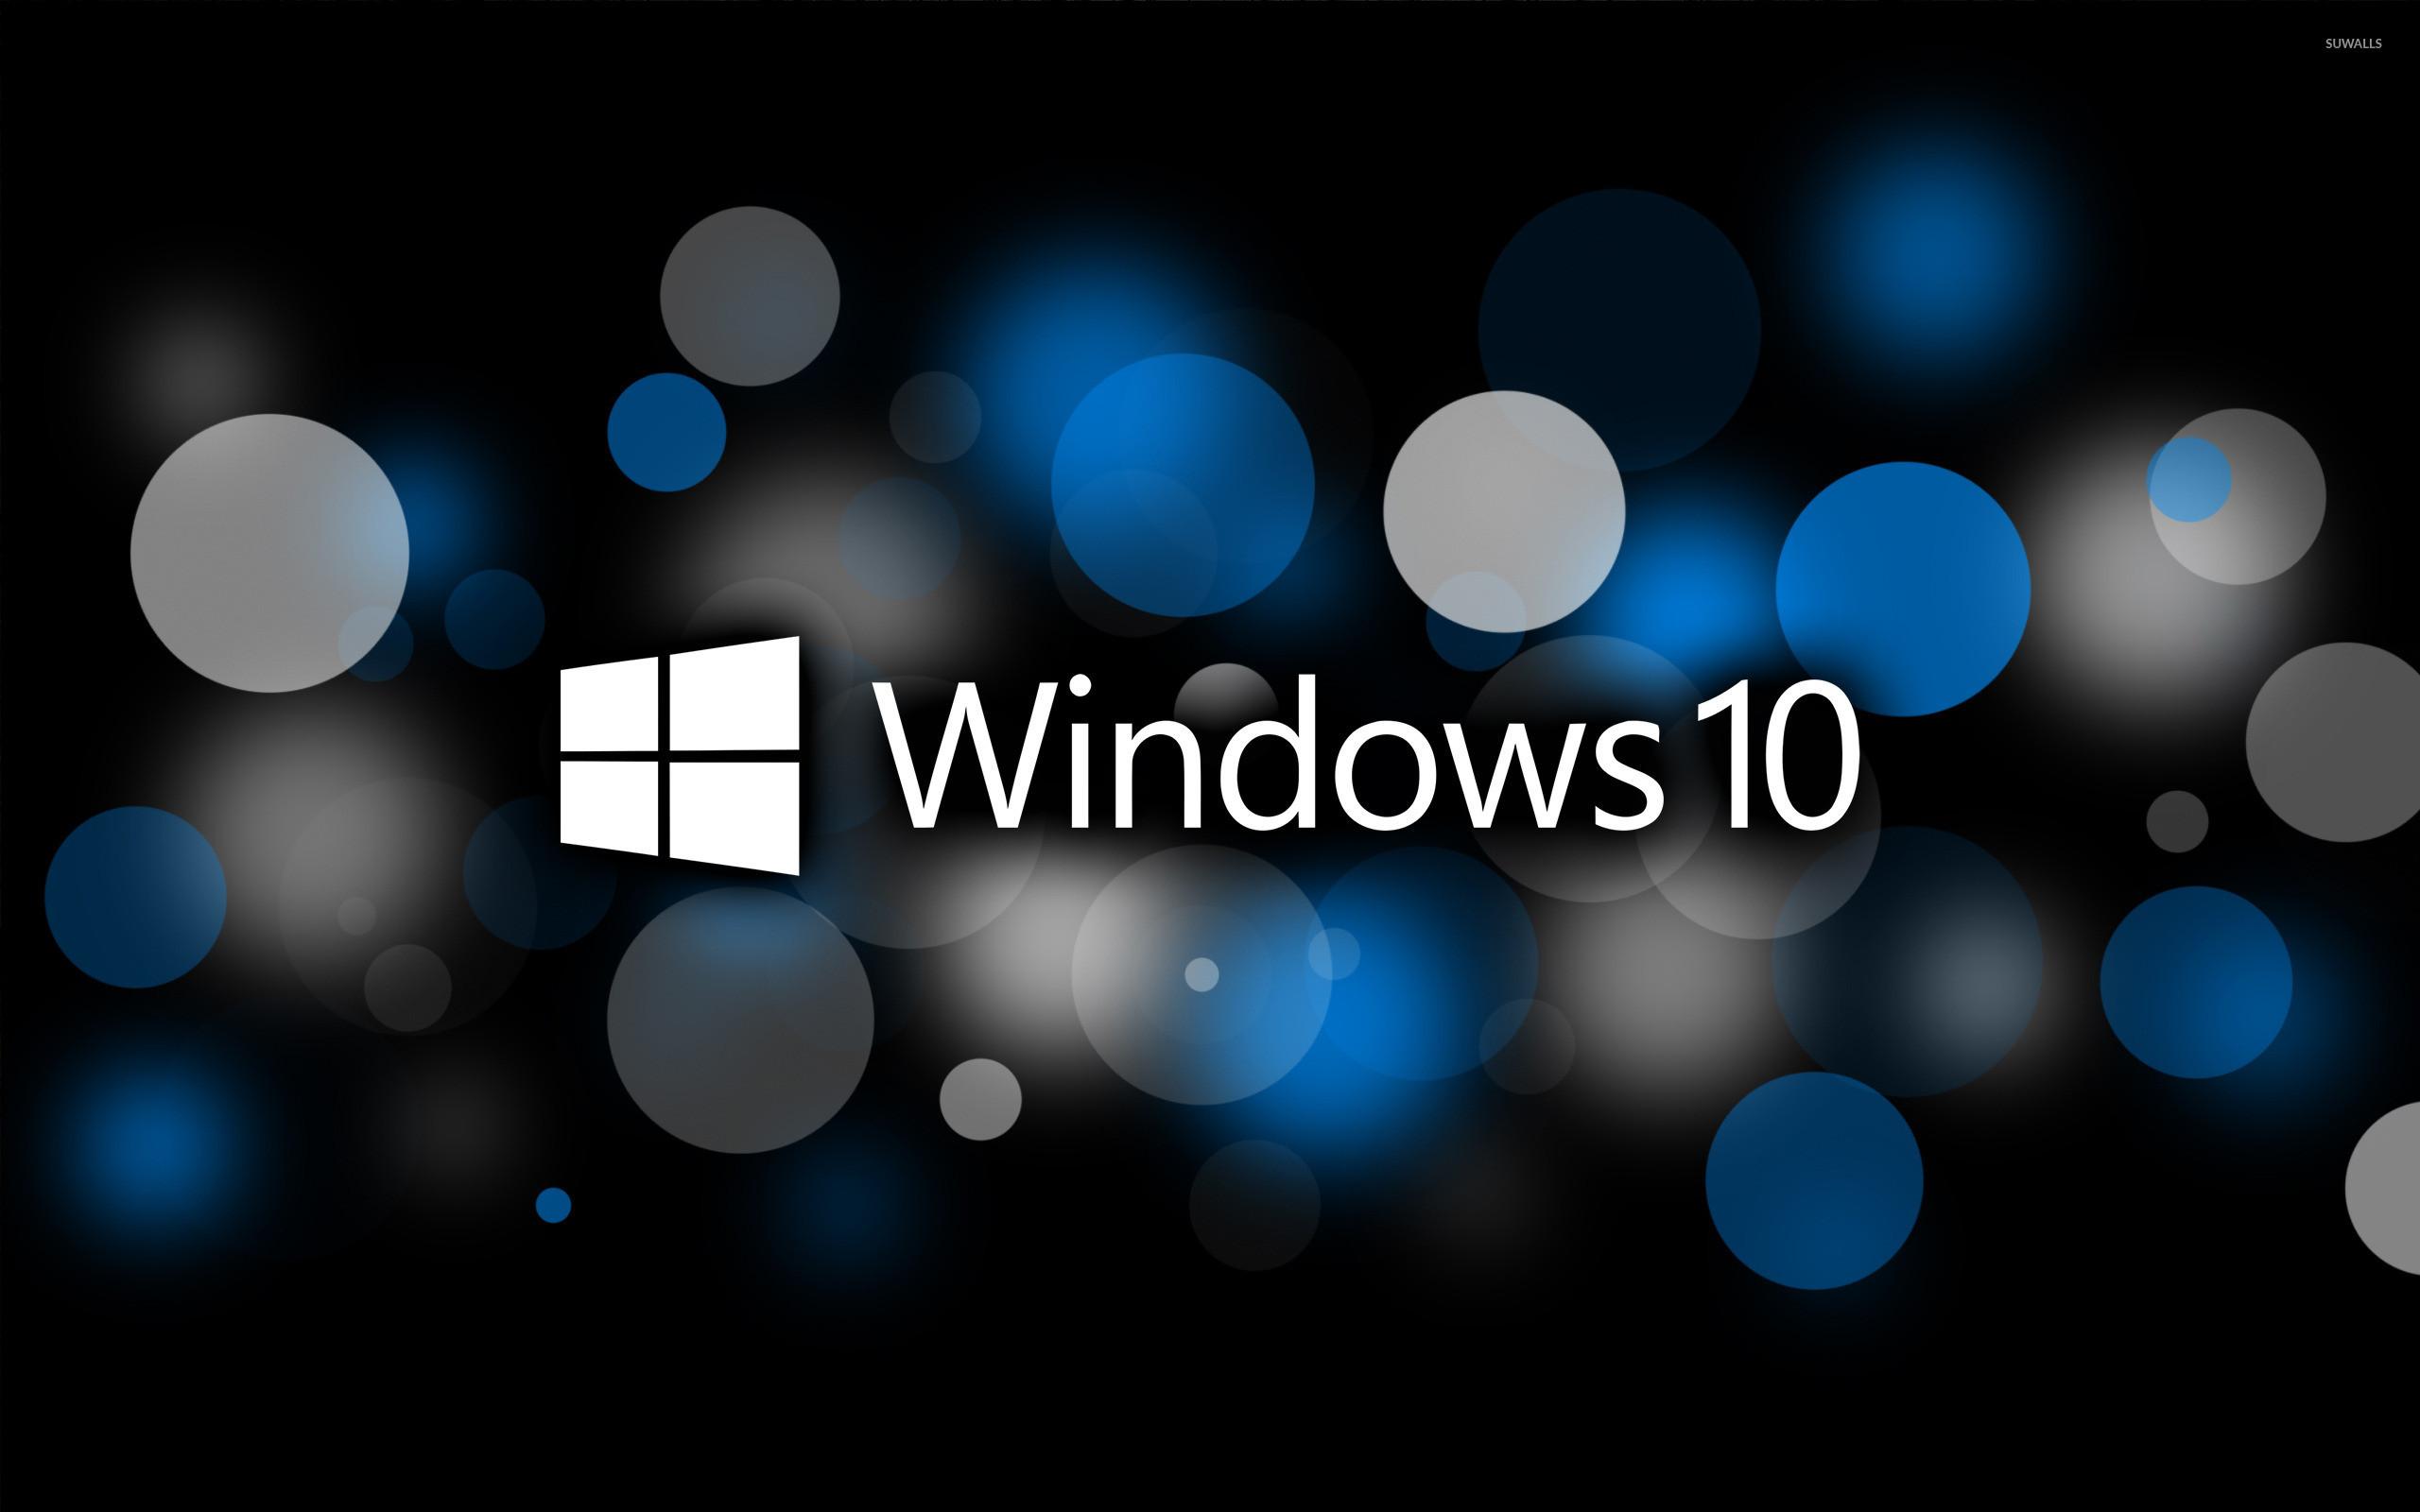 Windows 10 text logo on blue circles wallpaper jpg